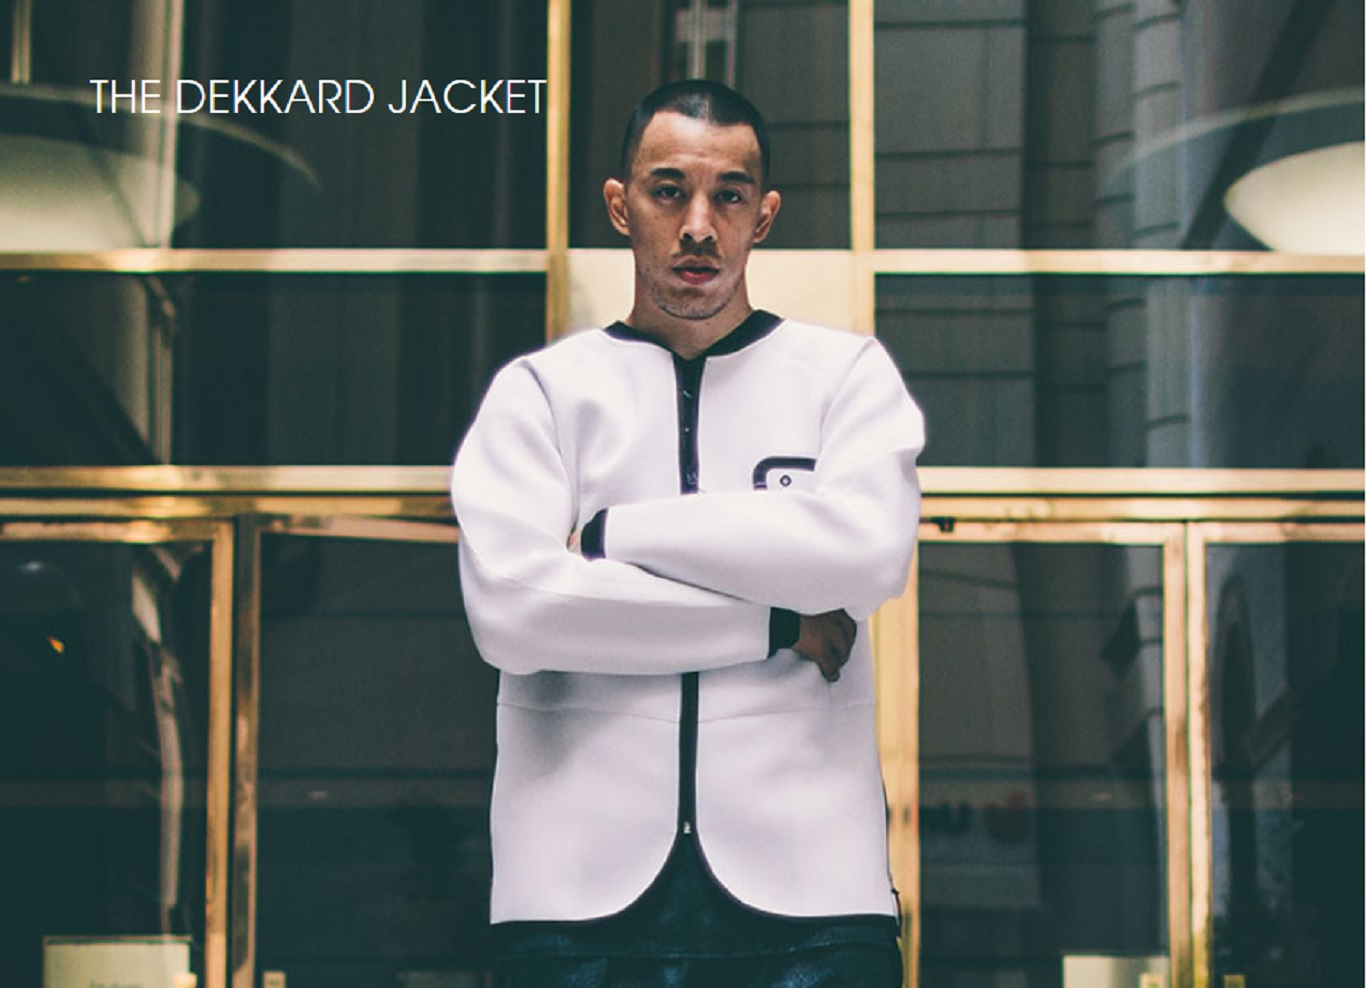 brandblack dekkard jacket